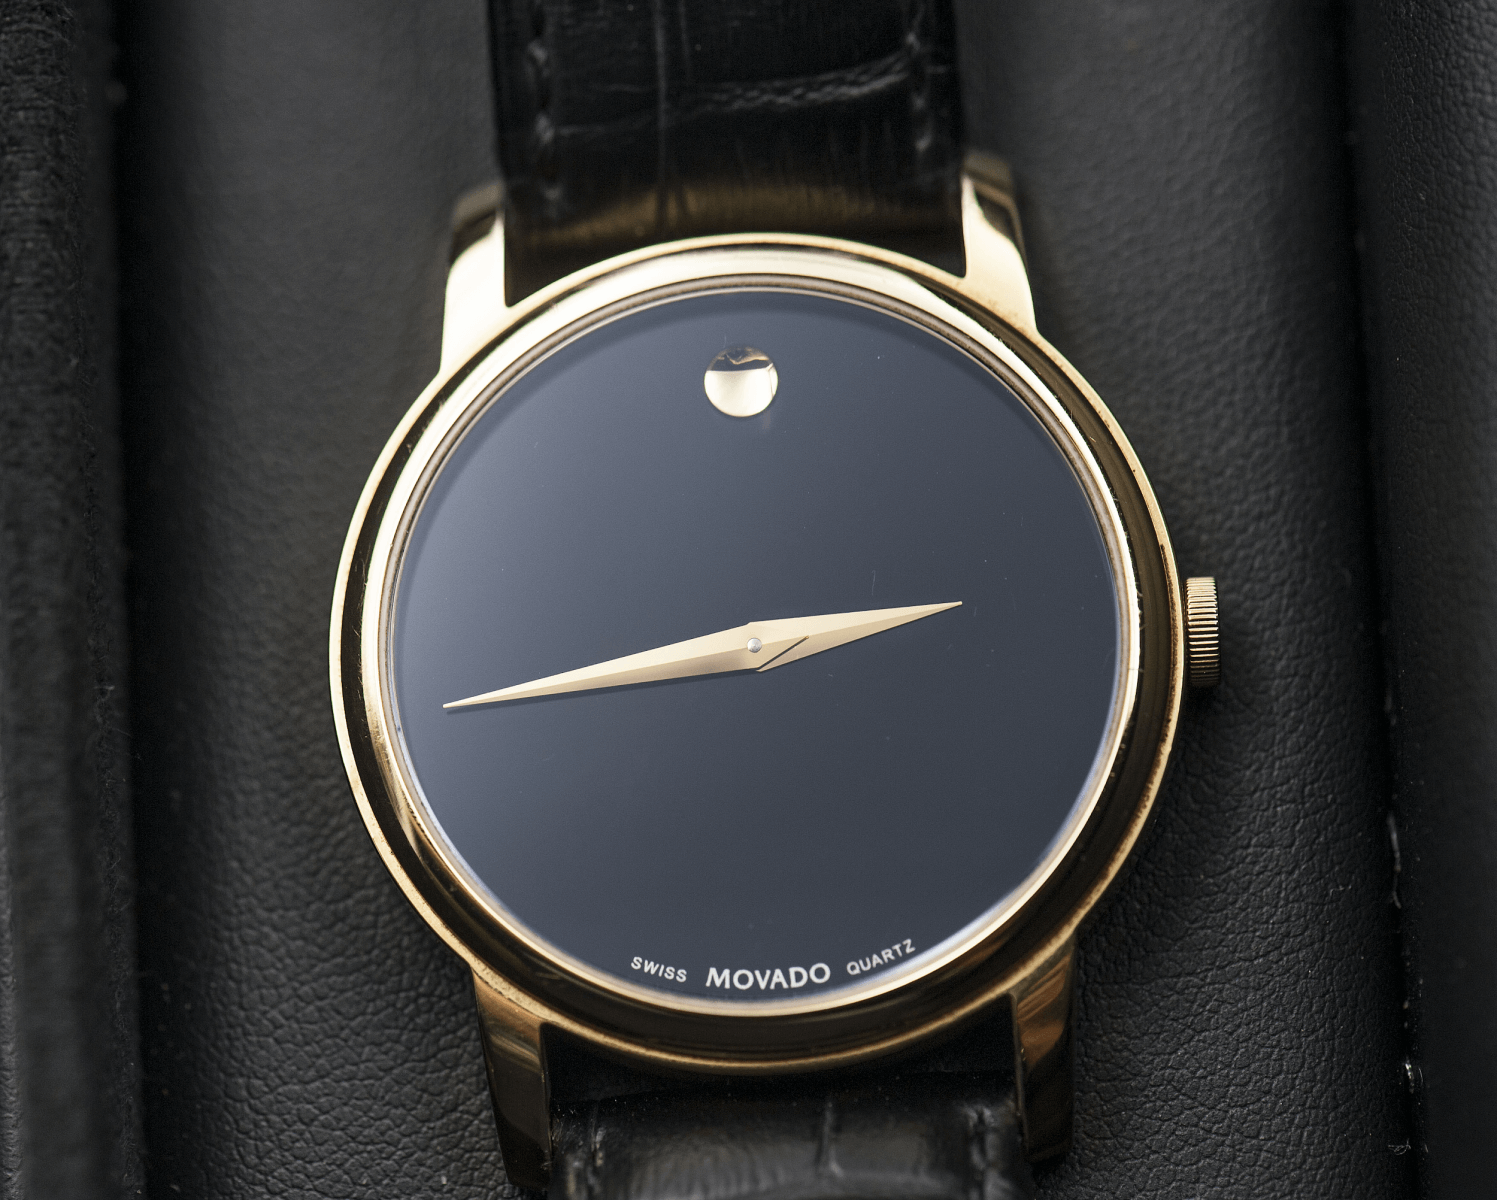 mặt số đồng hồ movado giả